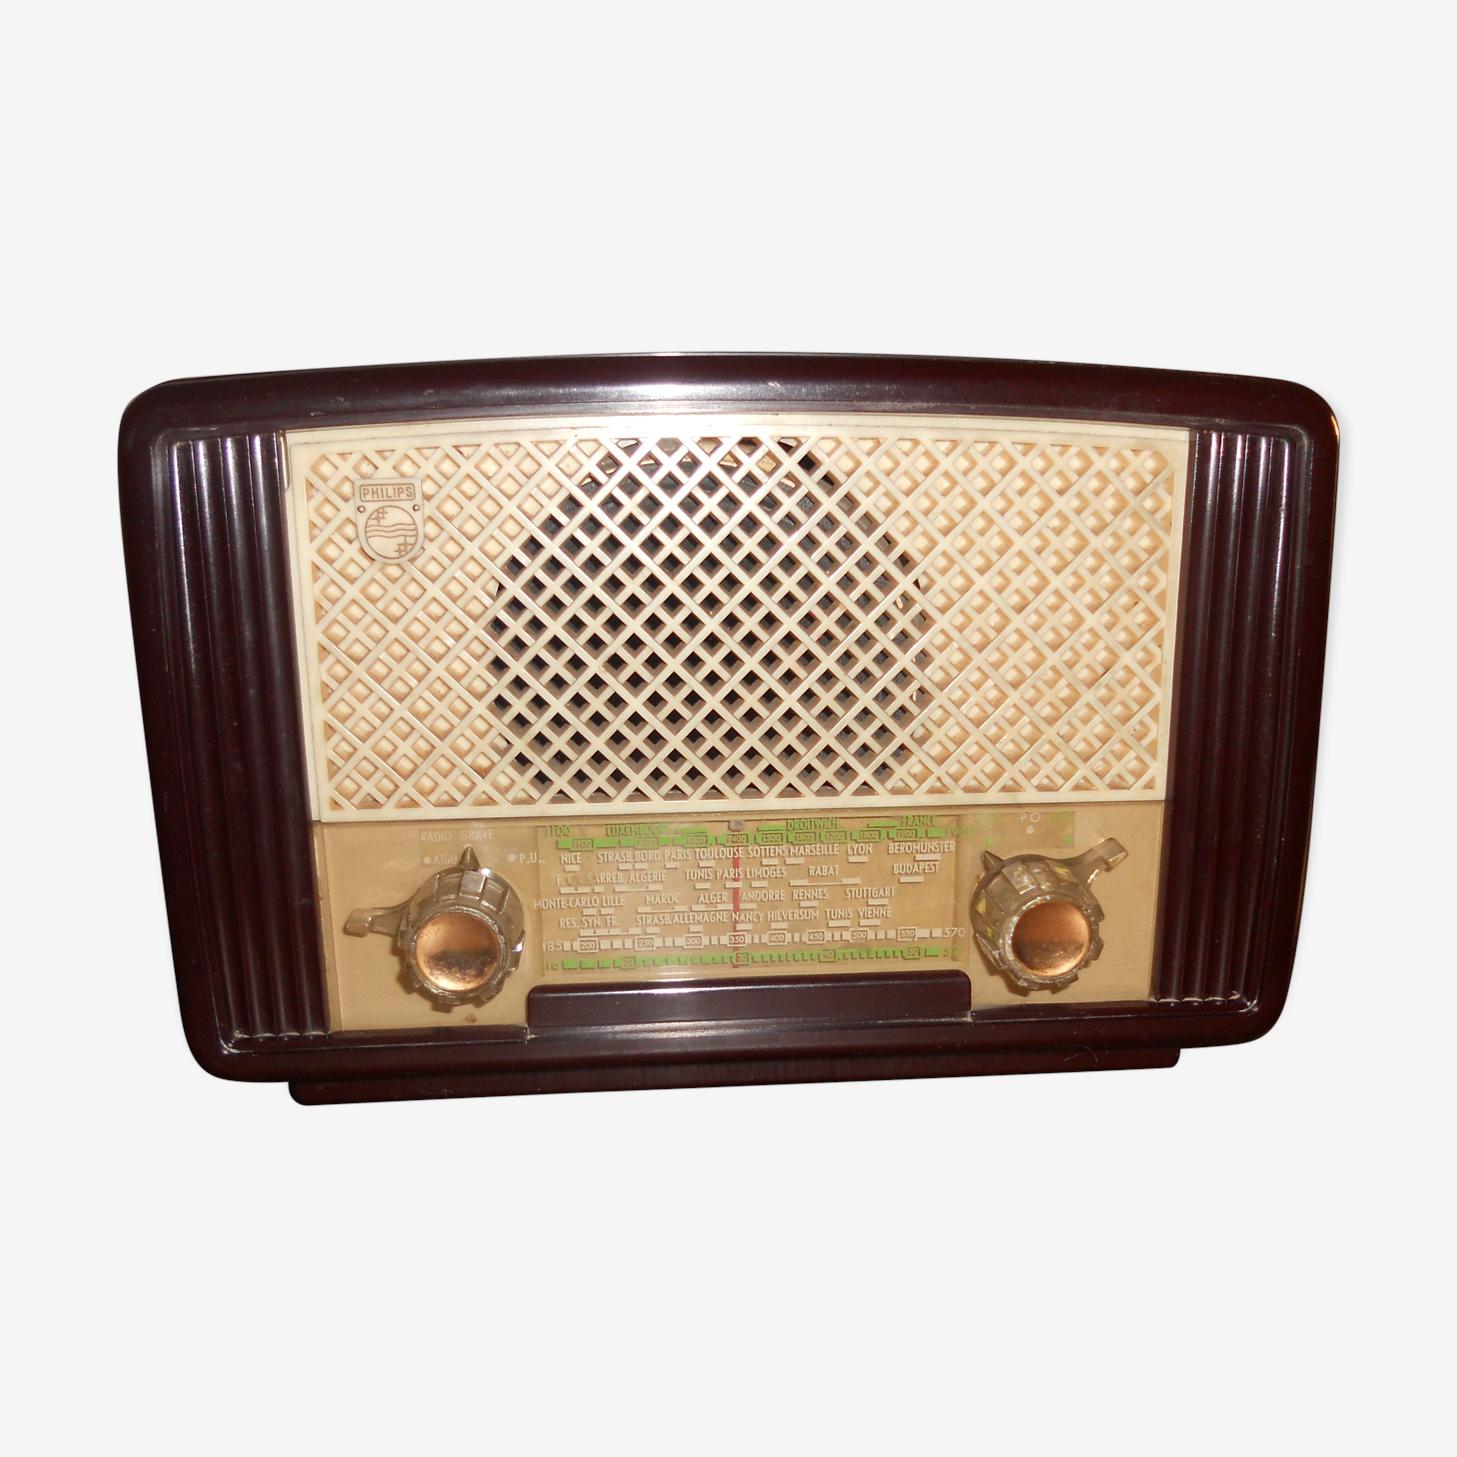 Poste radio Philips vintage